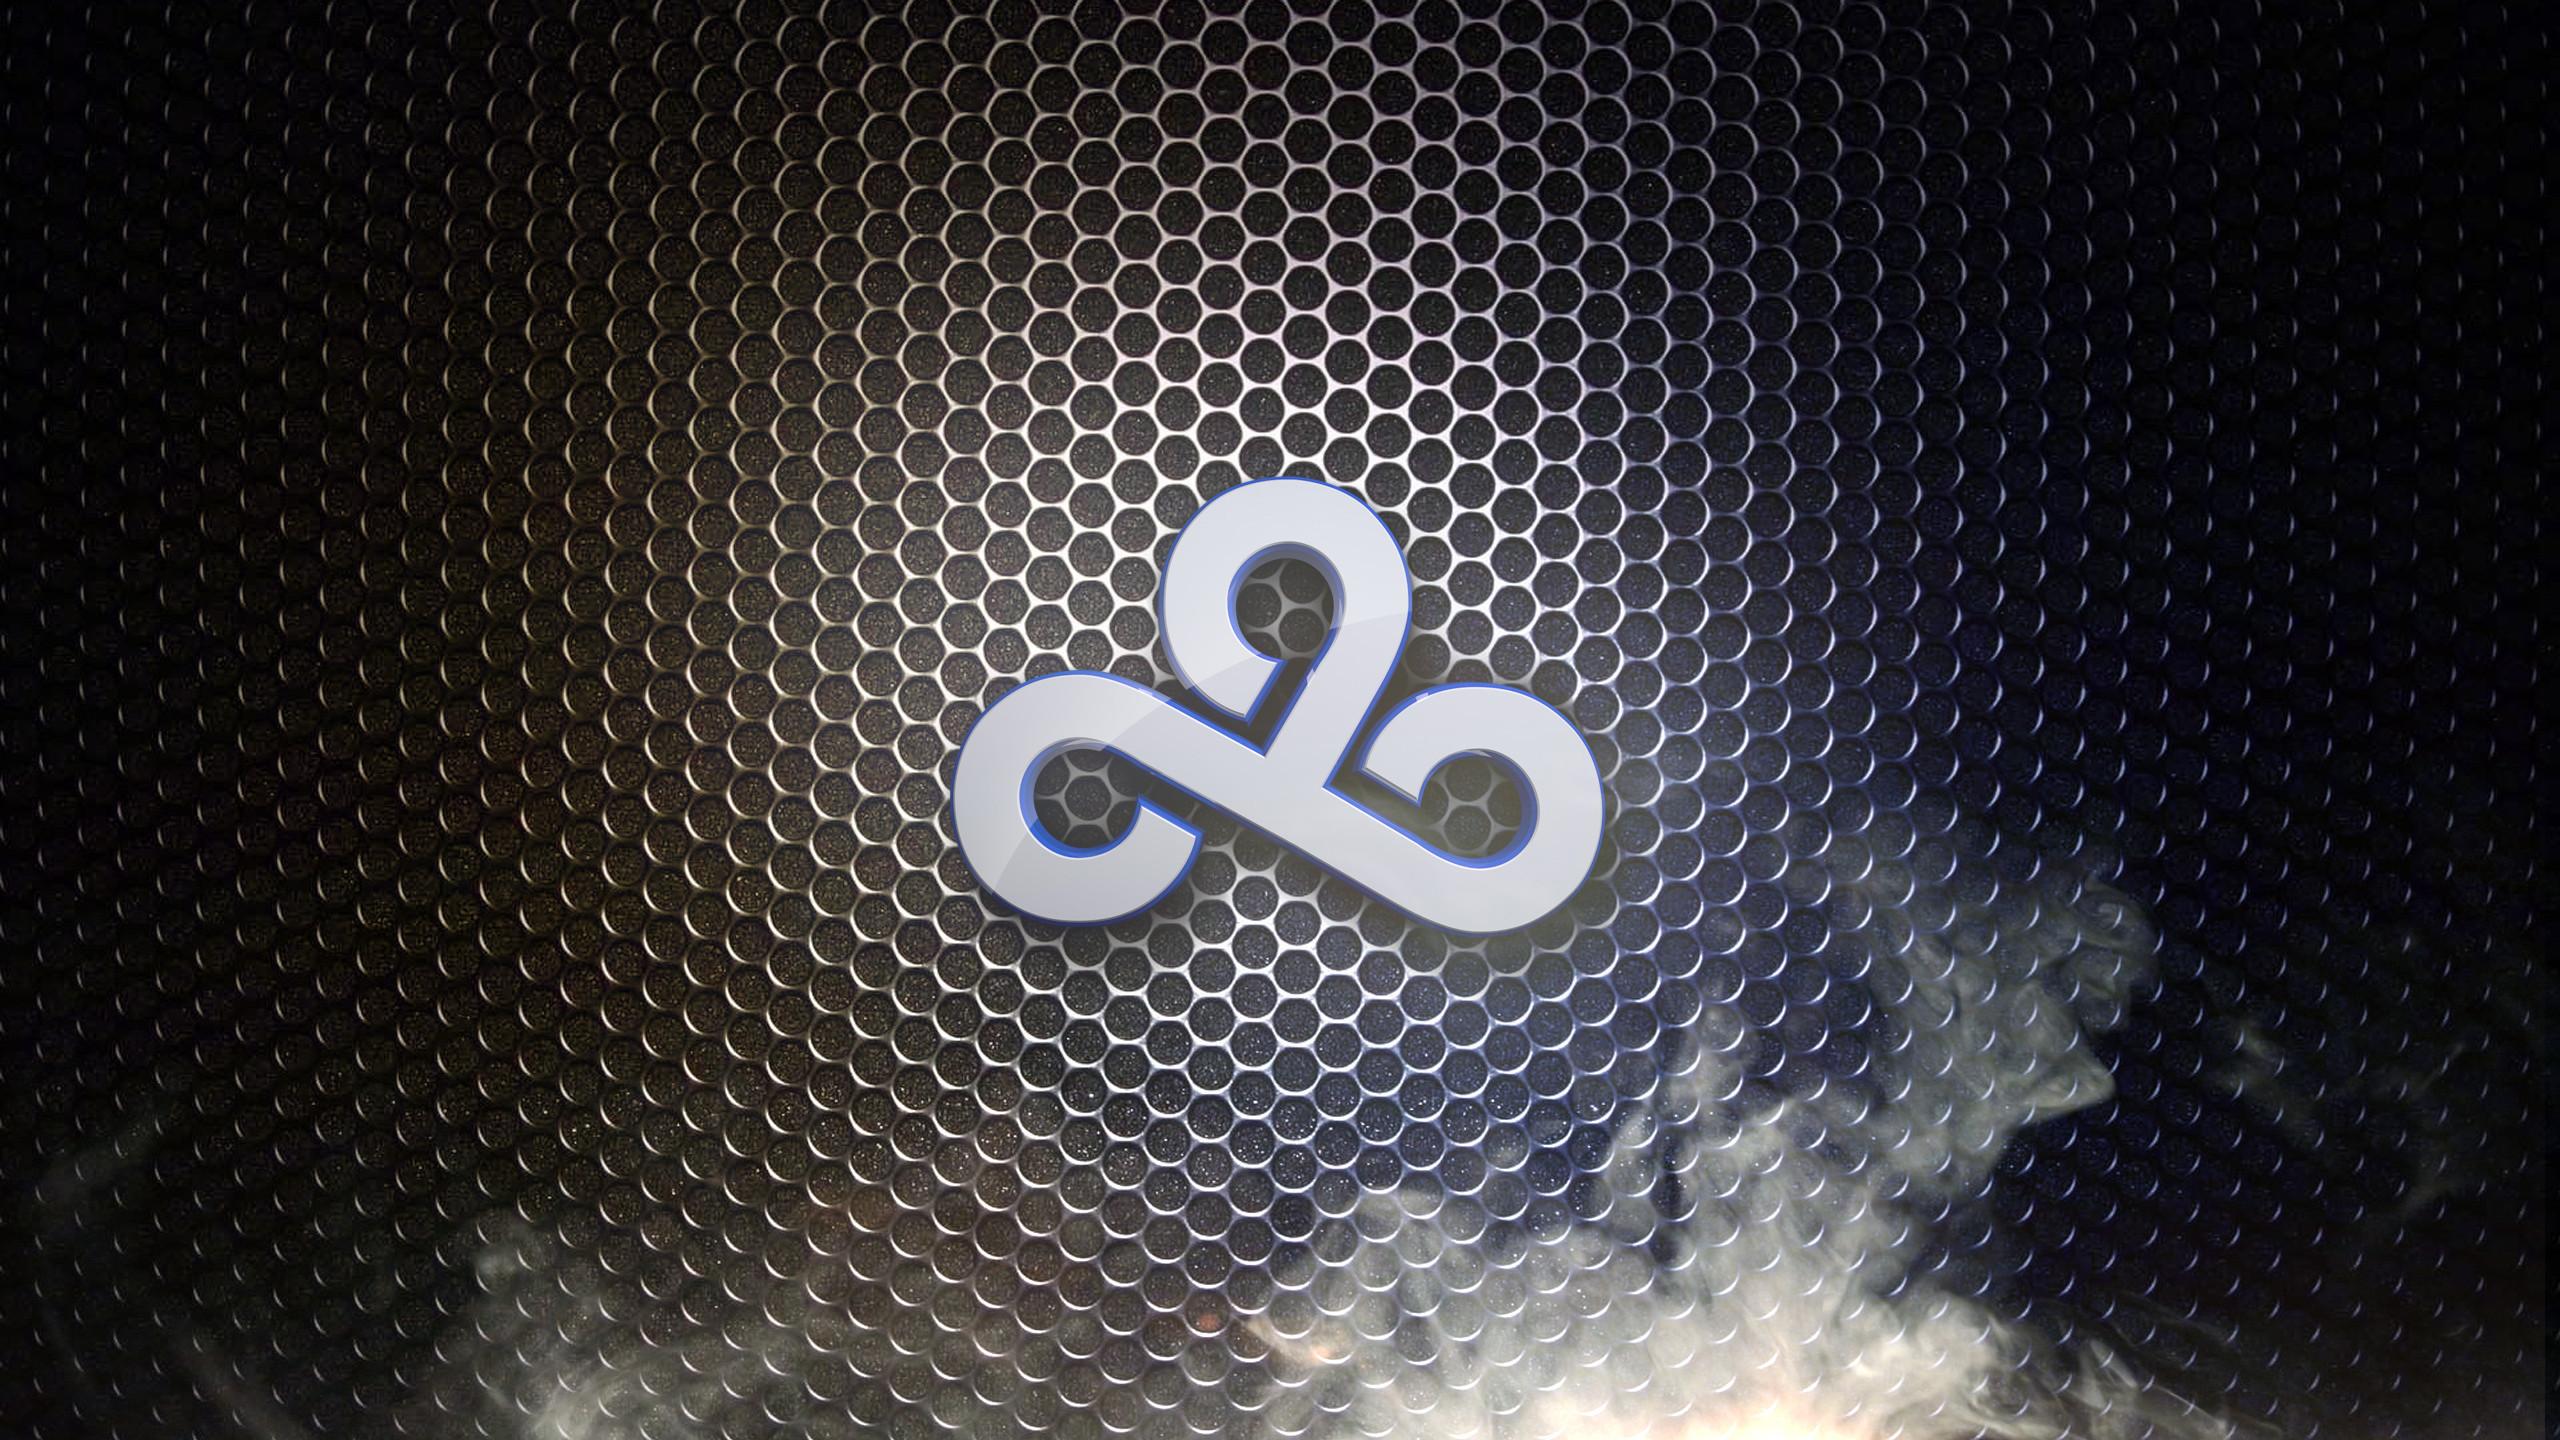 Cloud9 Wallpapers – Album on Imgur